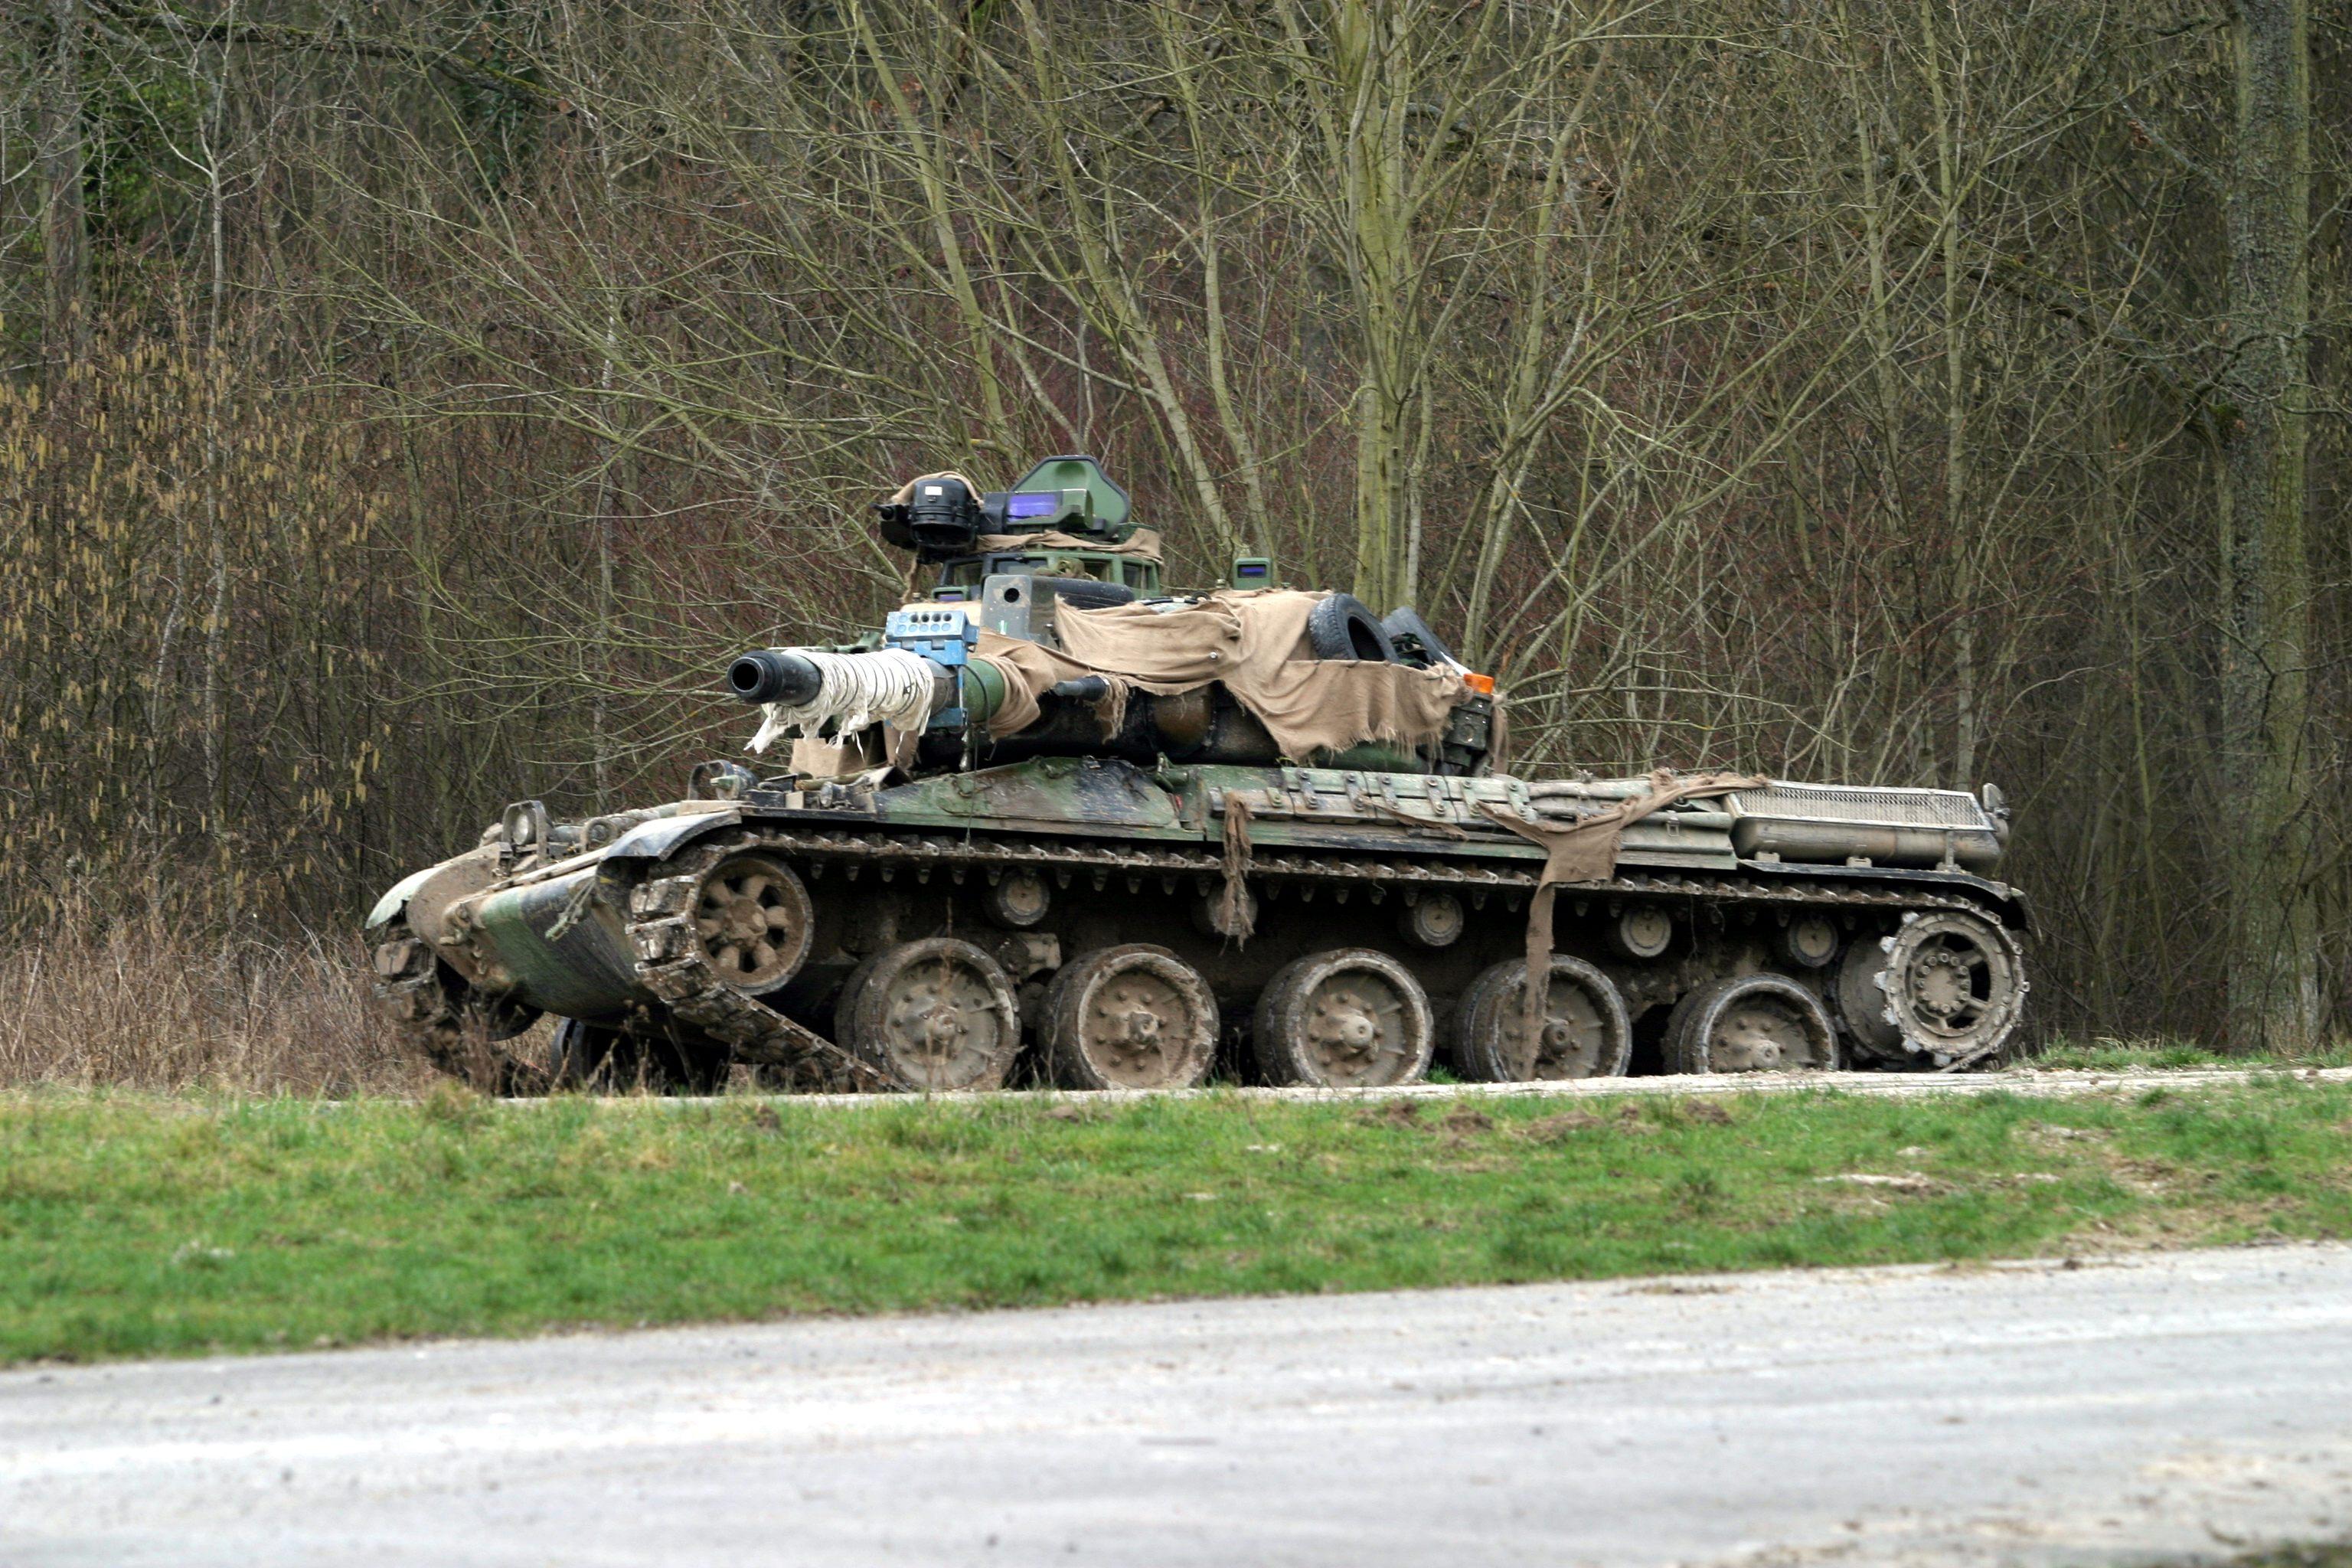 http://de.academic.ru/pictures/dewiki/65/AMX-30.JPG